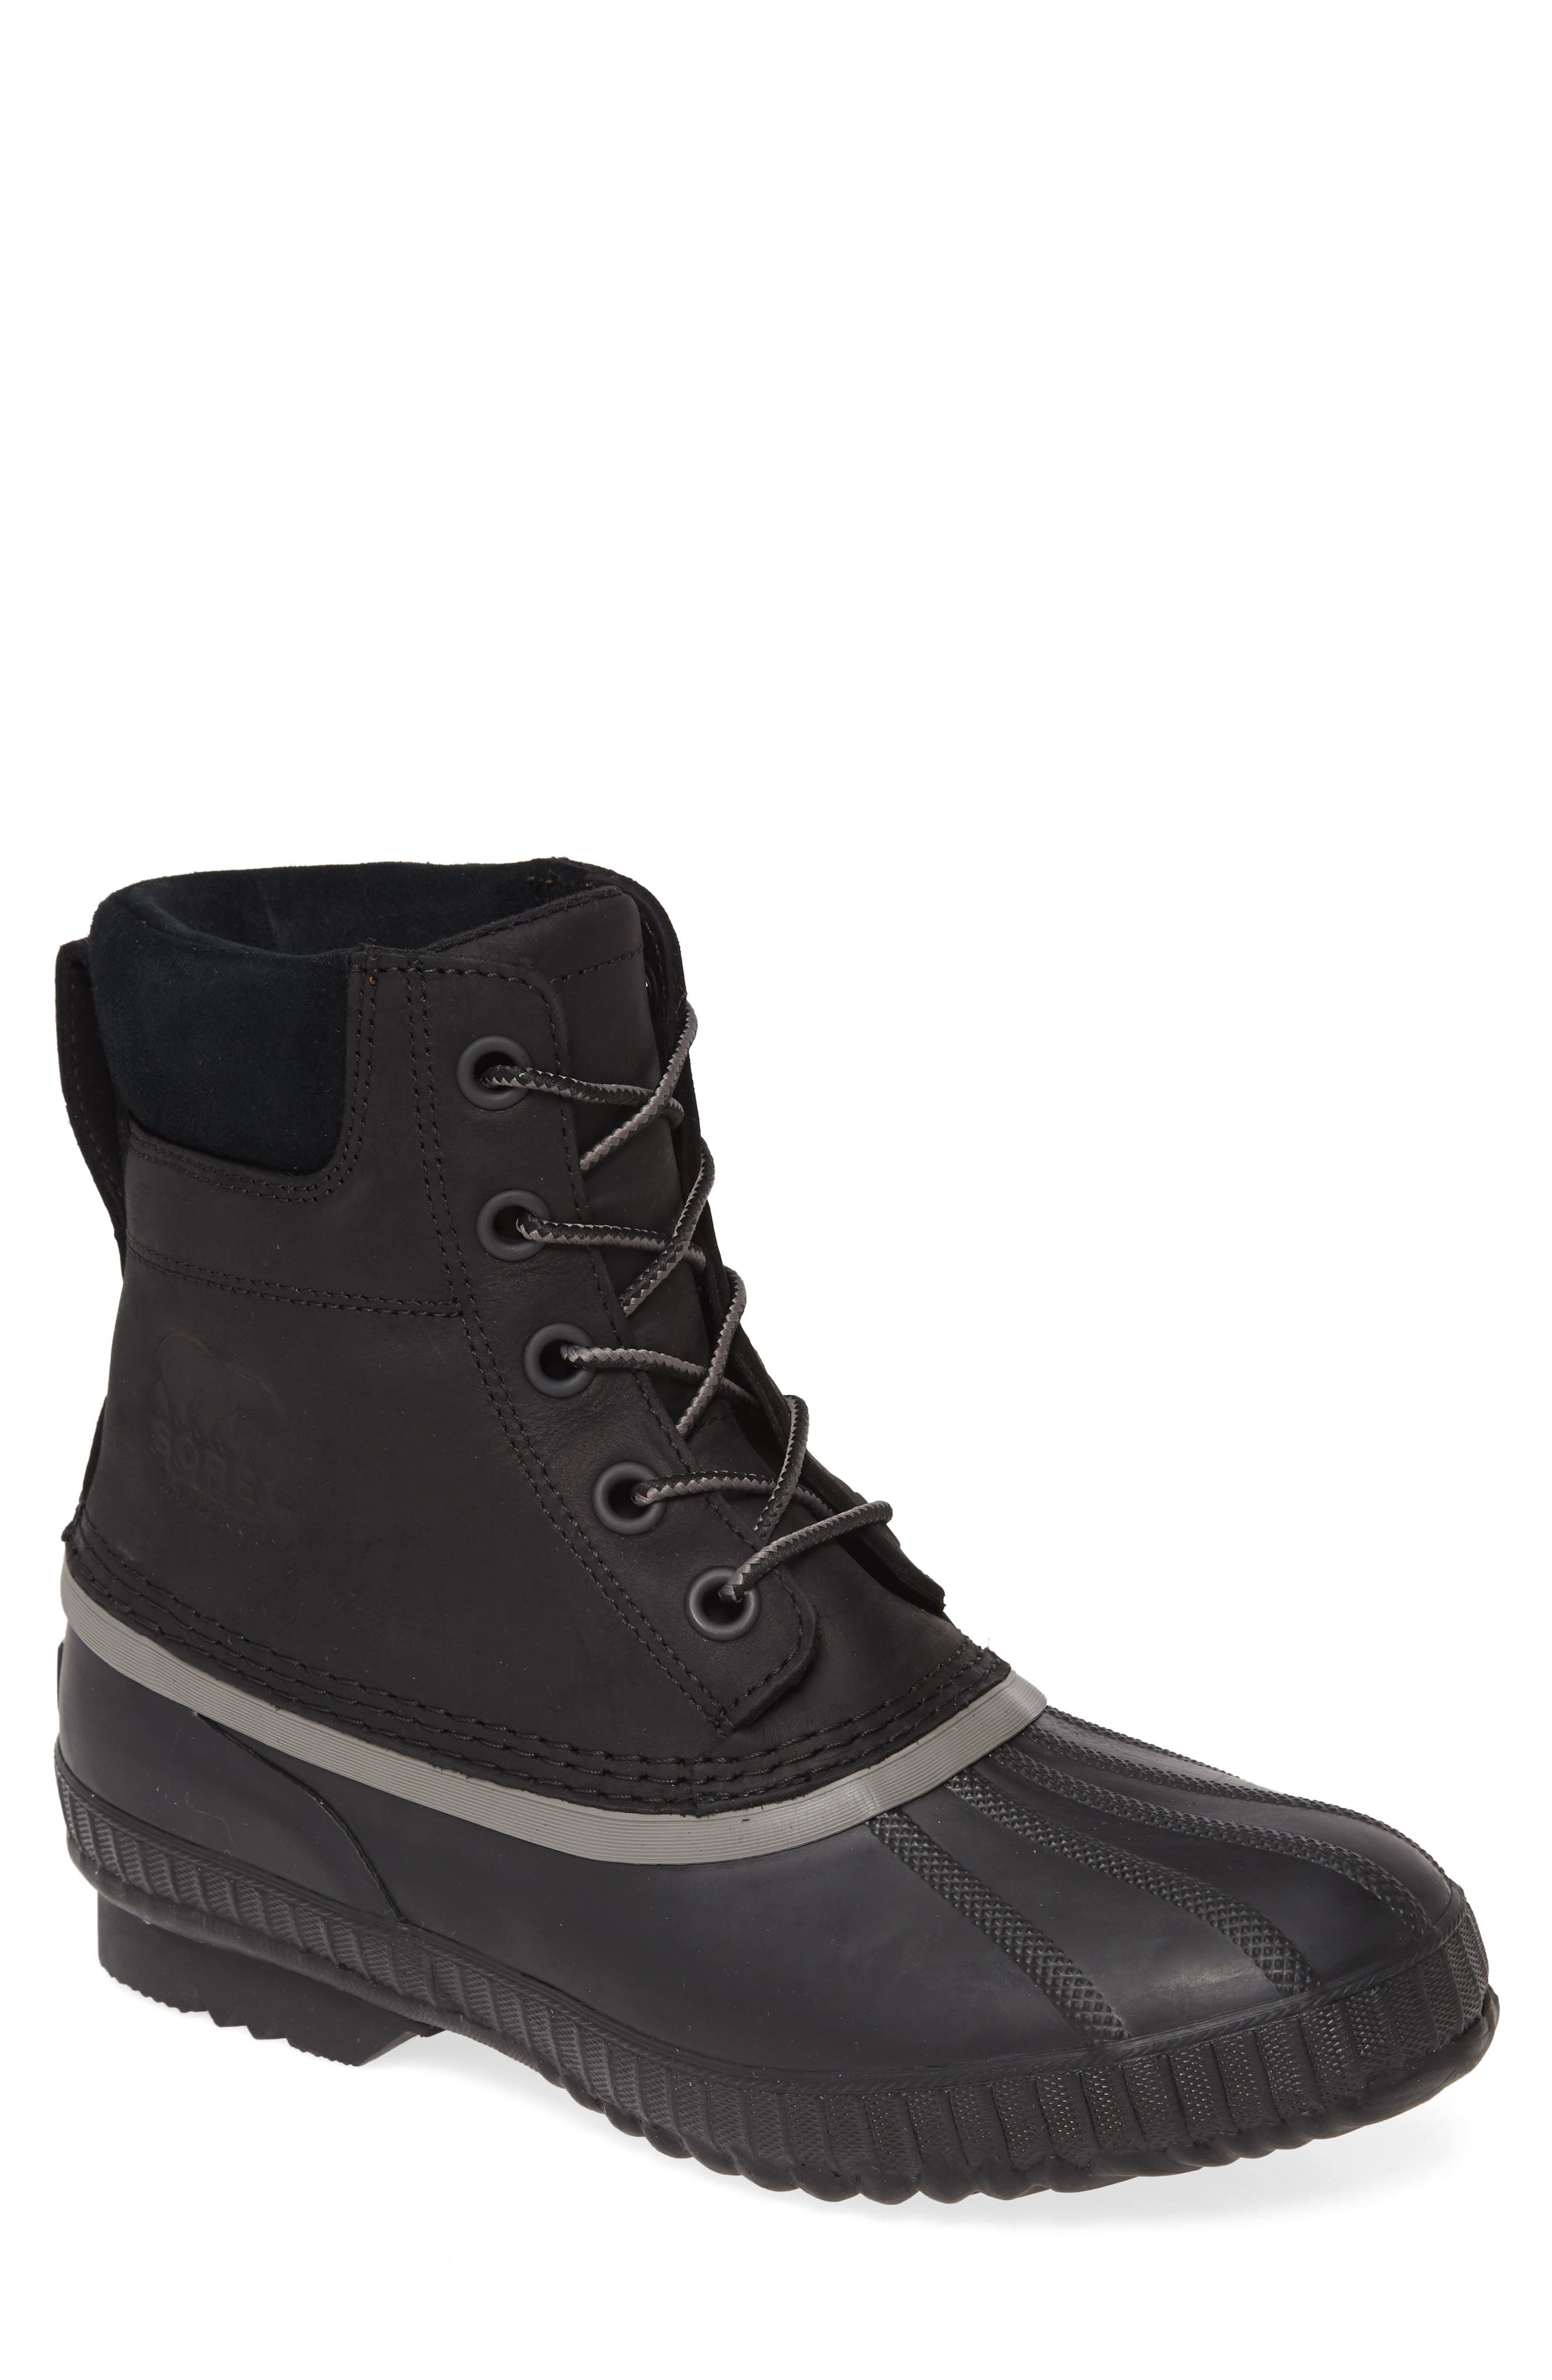 Sale: Men's SOREL Boots   Nordstrom